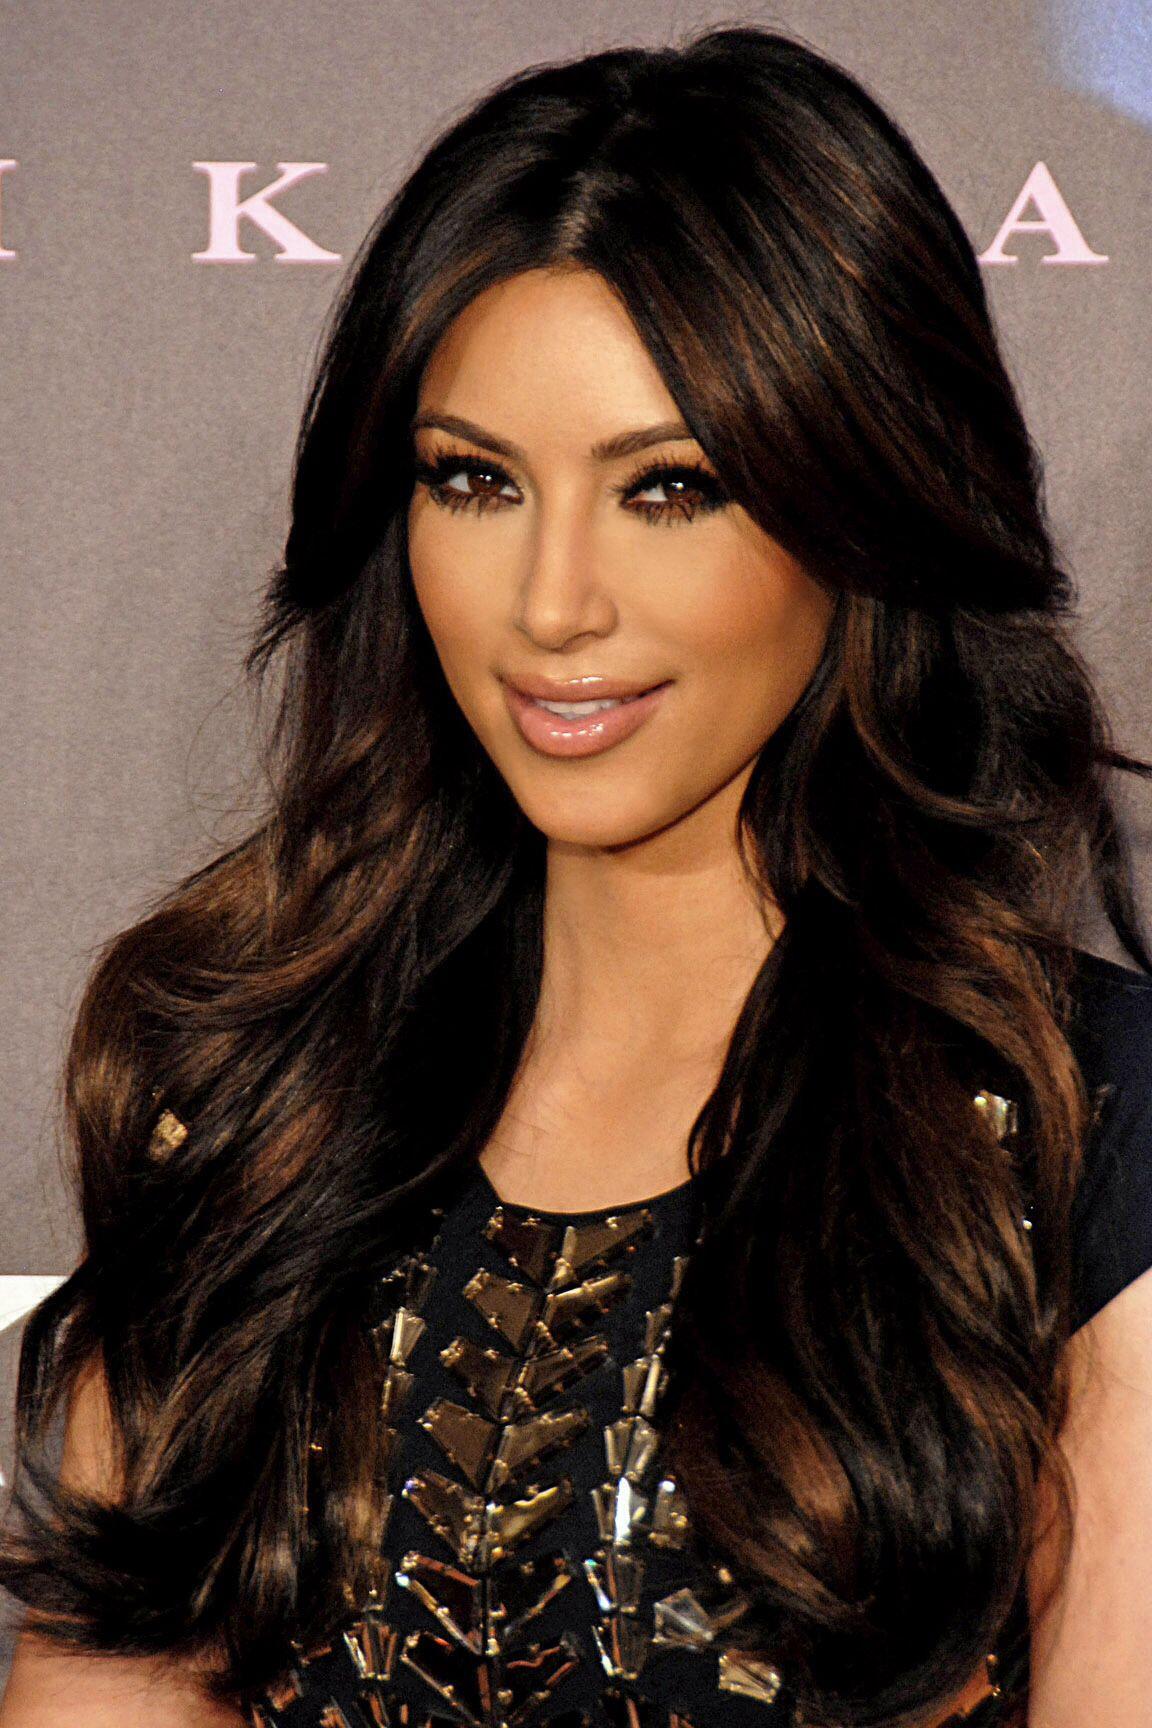 Kim kardashian middle part layered front side bangs on both sides